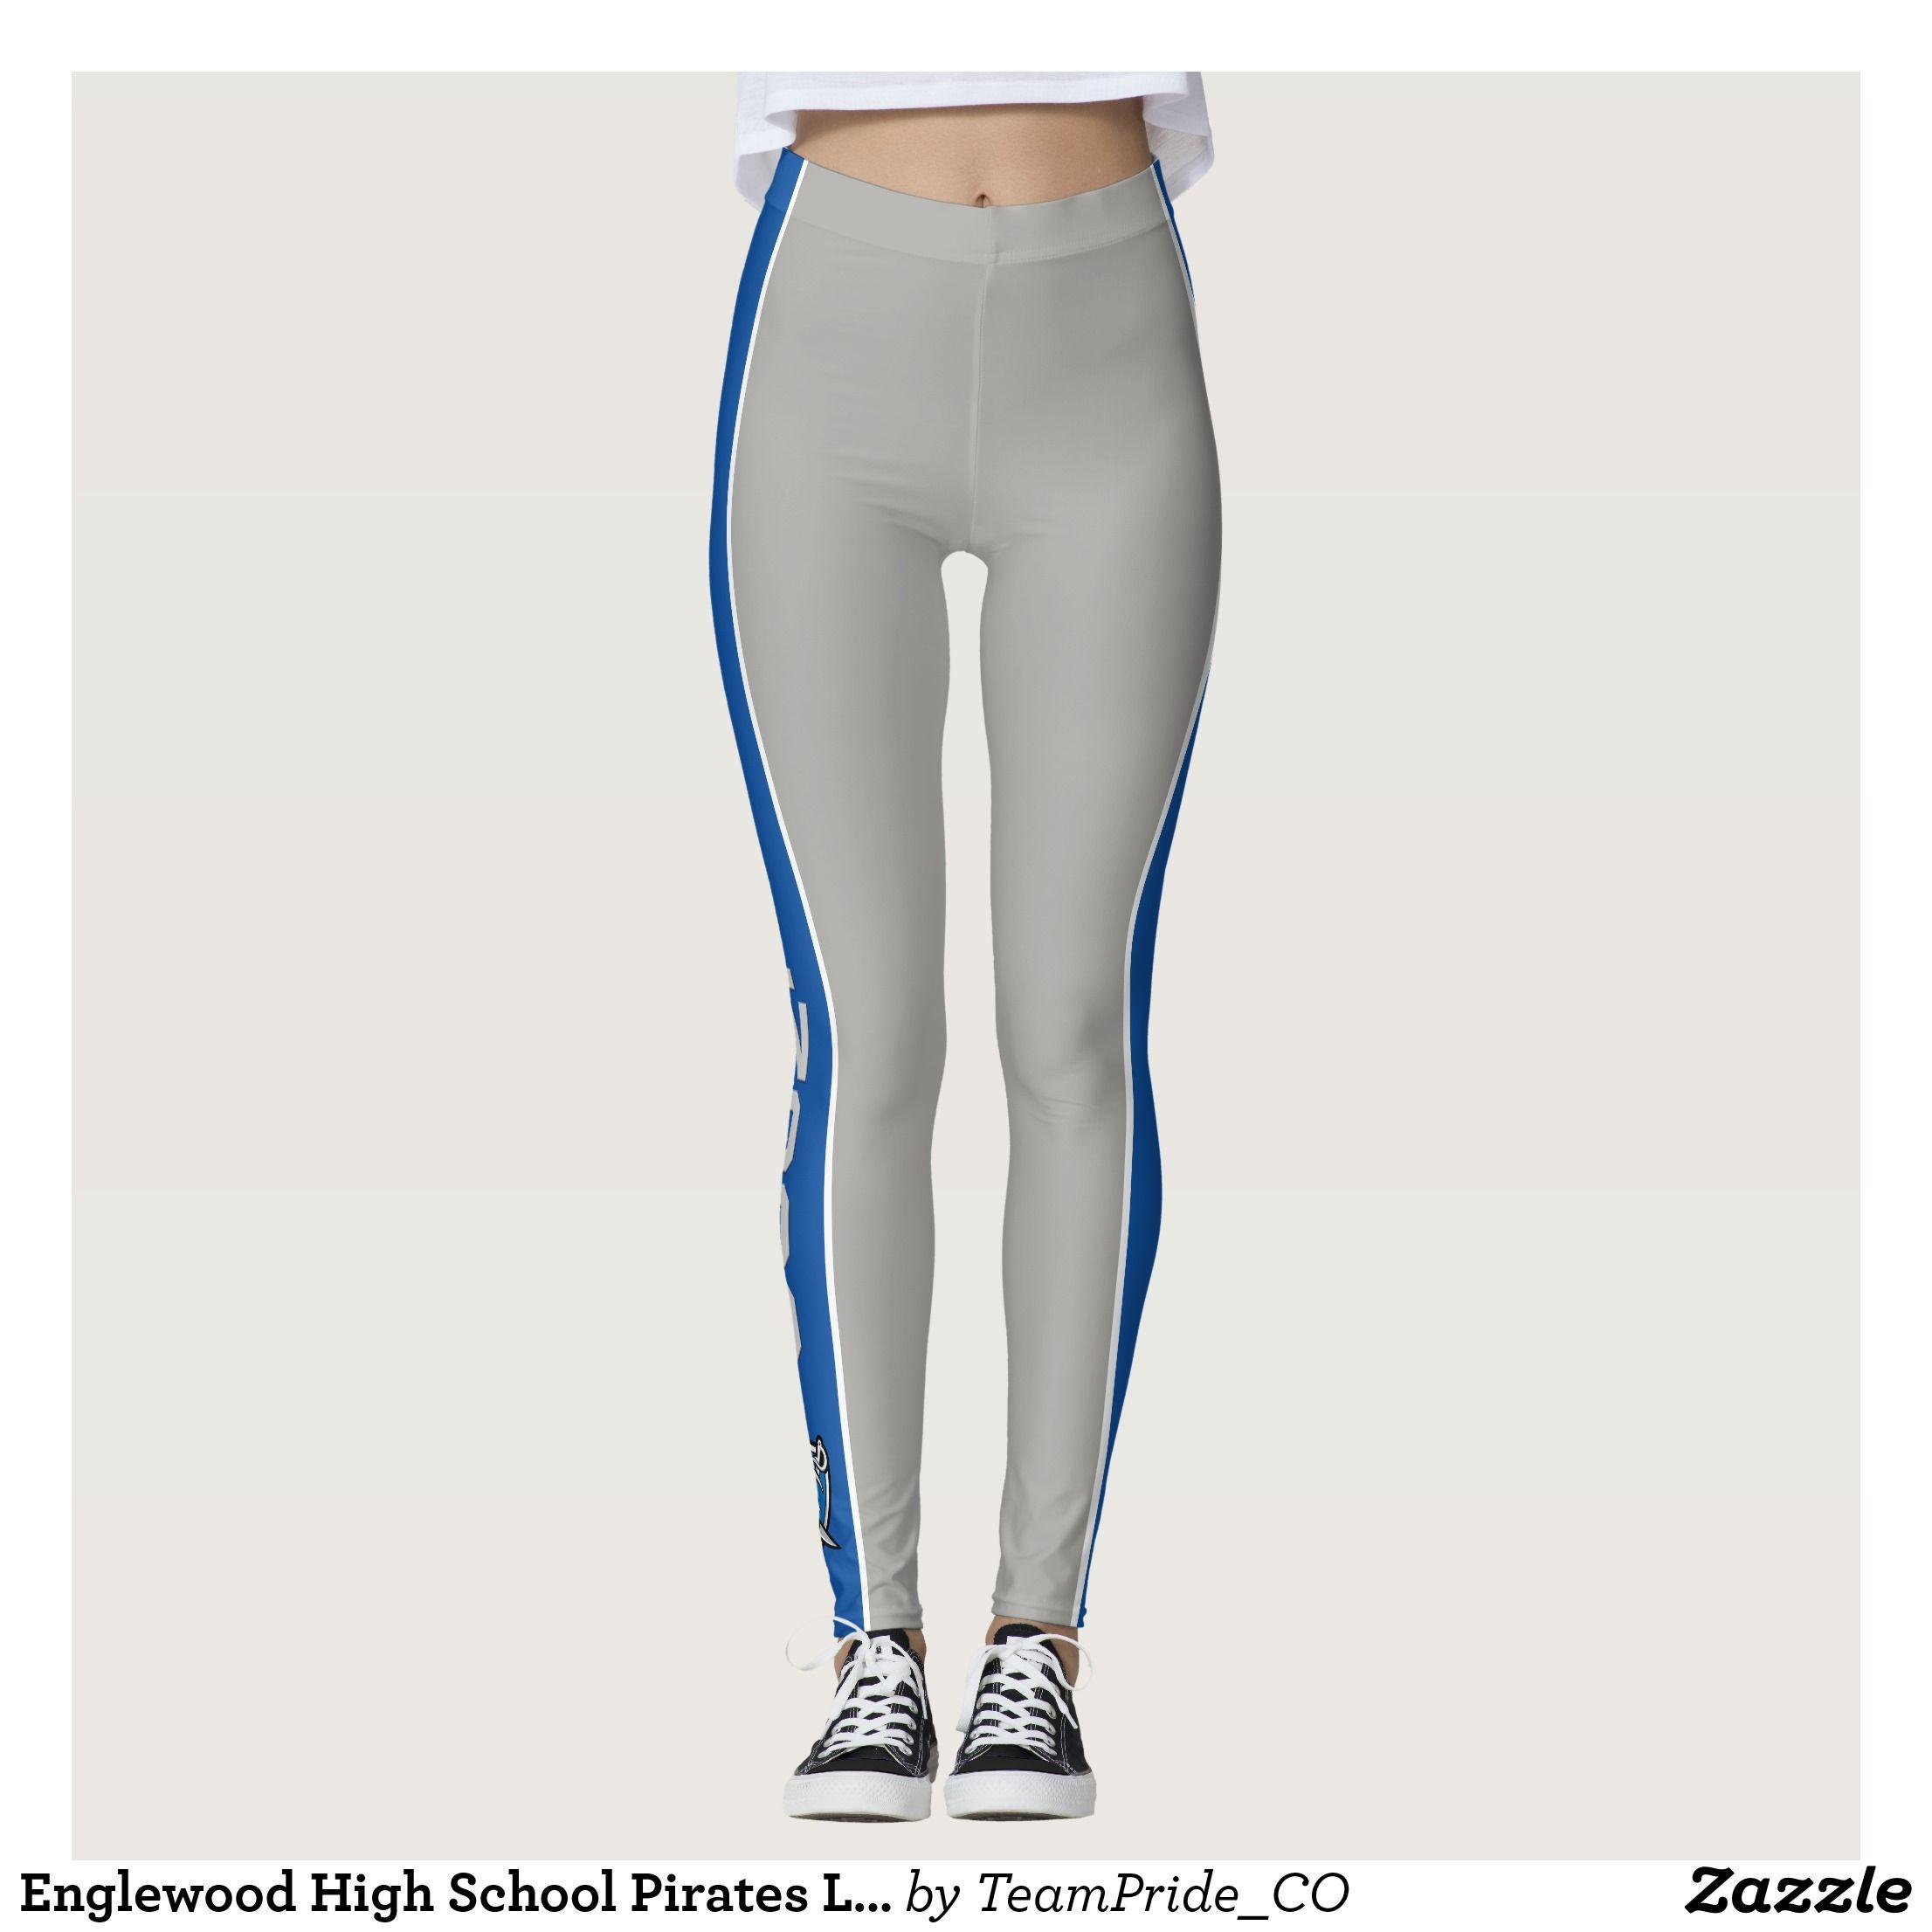 e6cc1242d5e336 Englewood High School Pirates Lines Leggings | Running tights ...